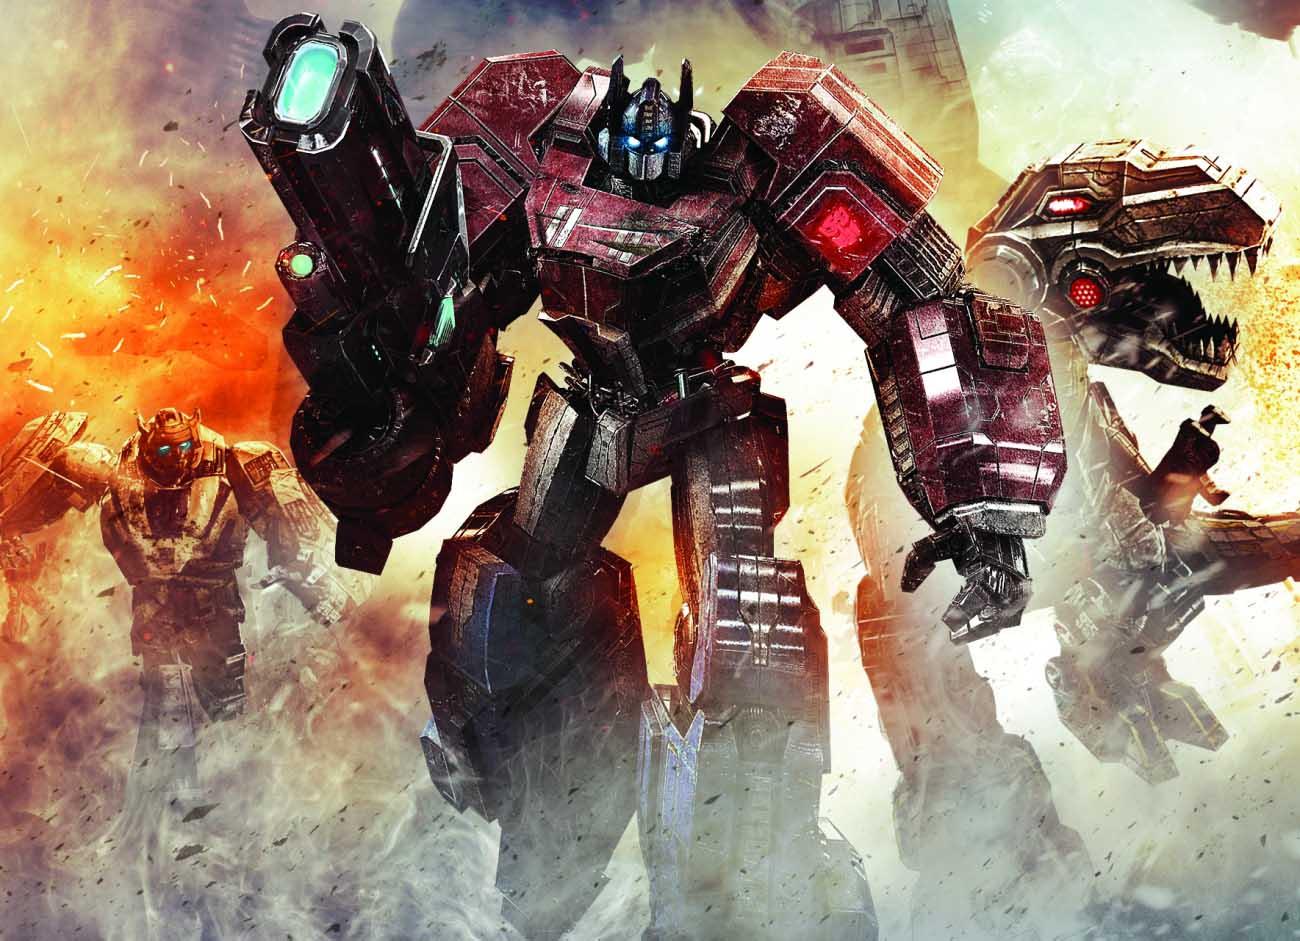 Transformers war for cybertron cheats xbox 360.